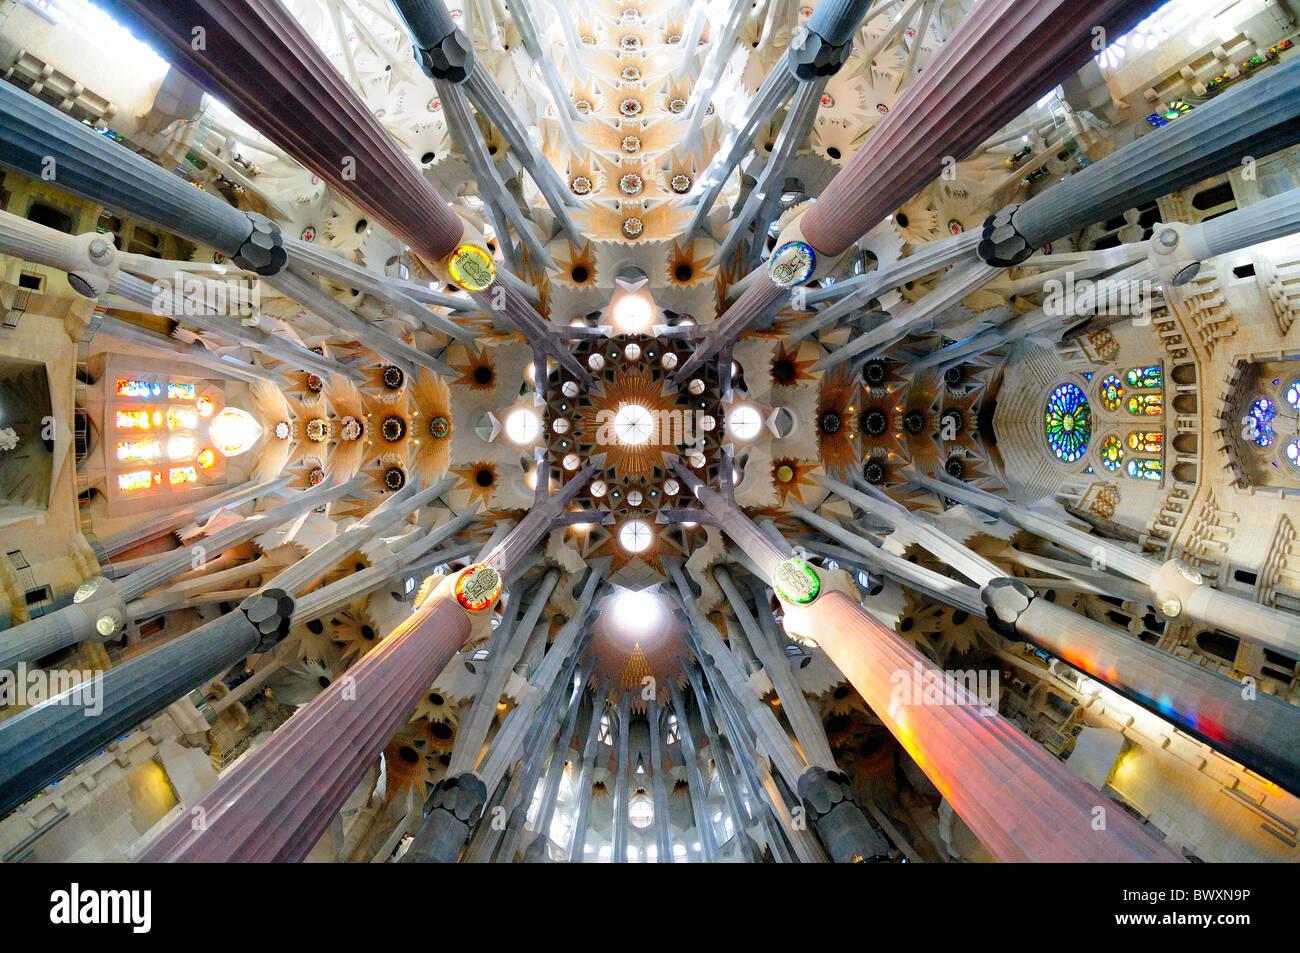 sagrada-familia-ceiling-and-columns-BWXN